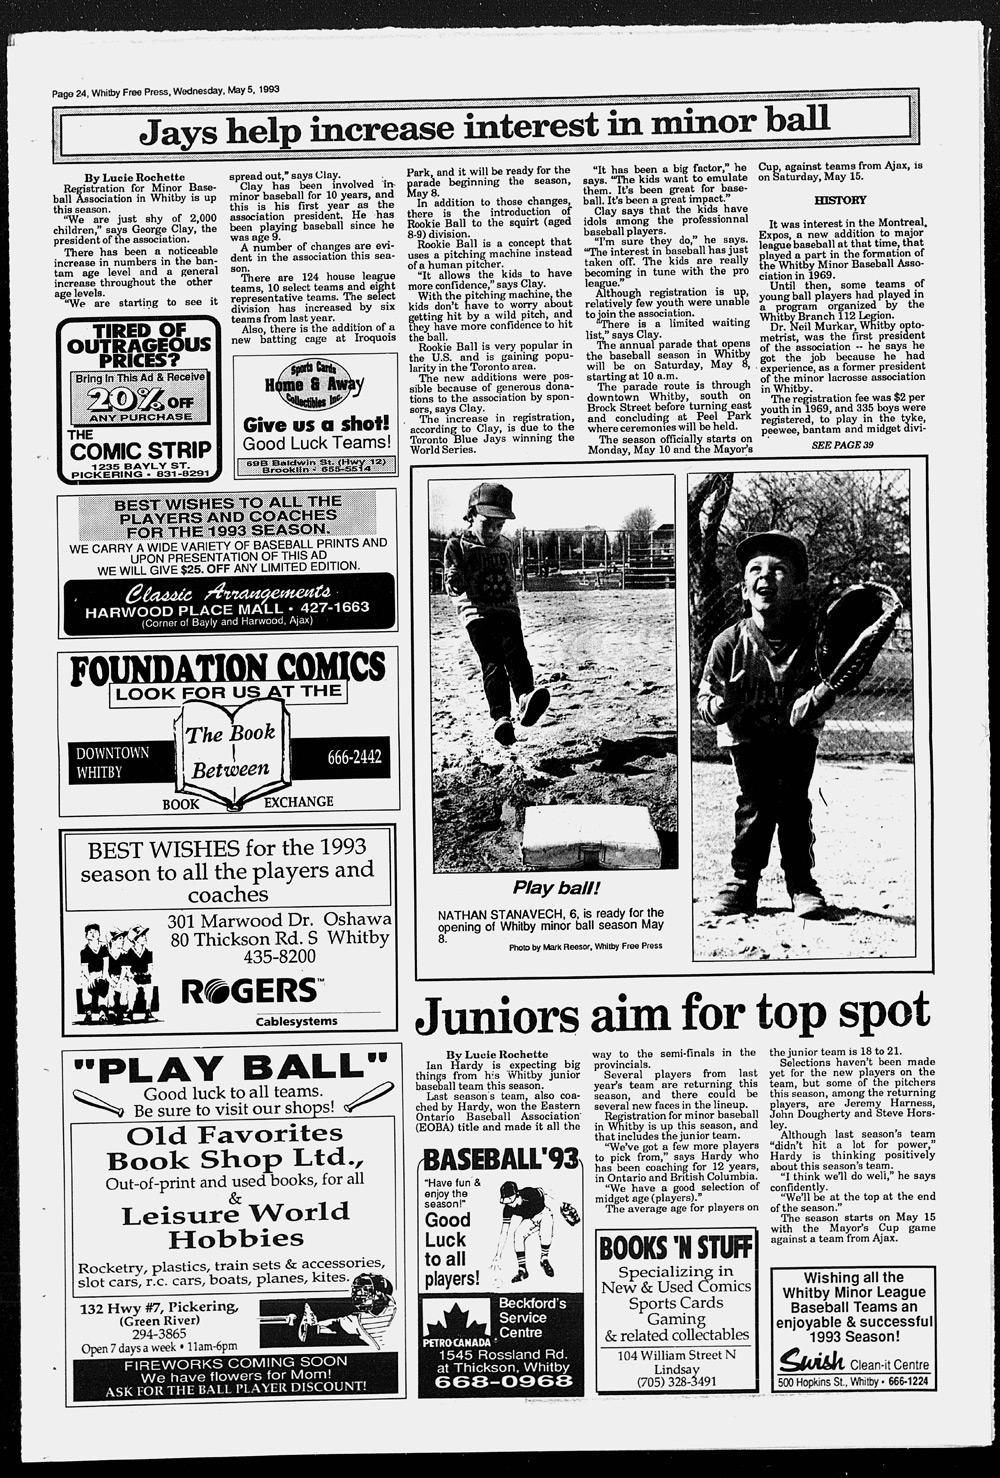 Whitby Free Press, 5 May 1993